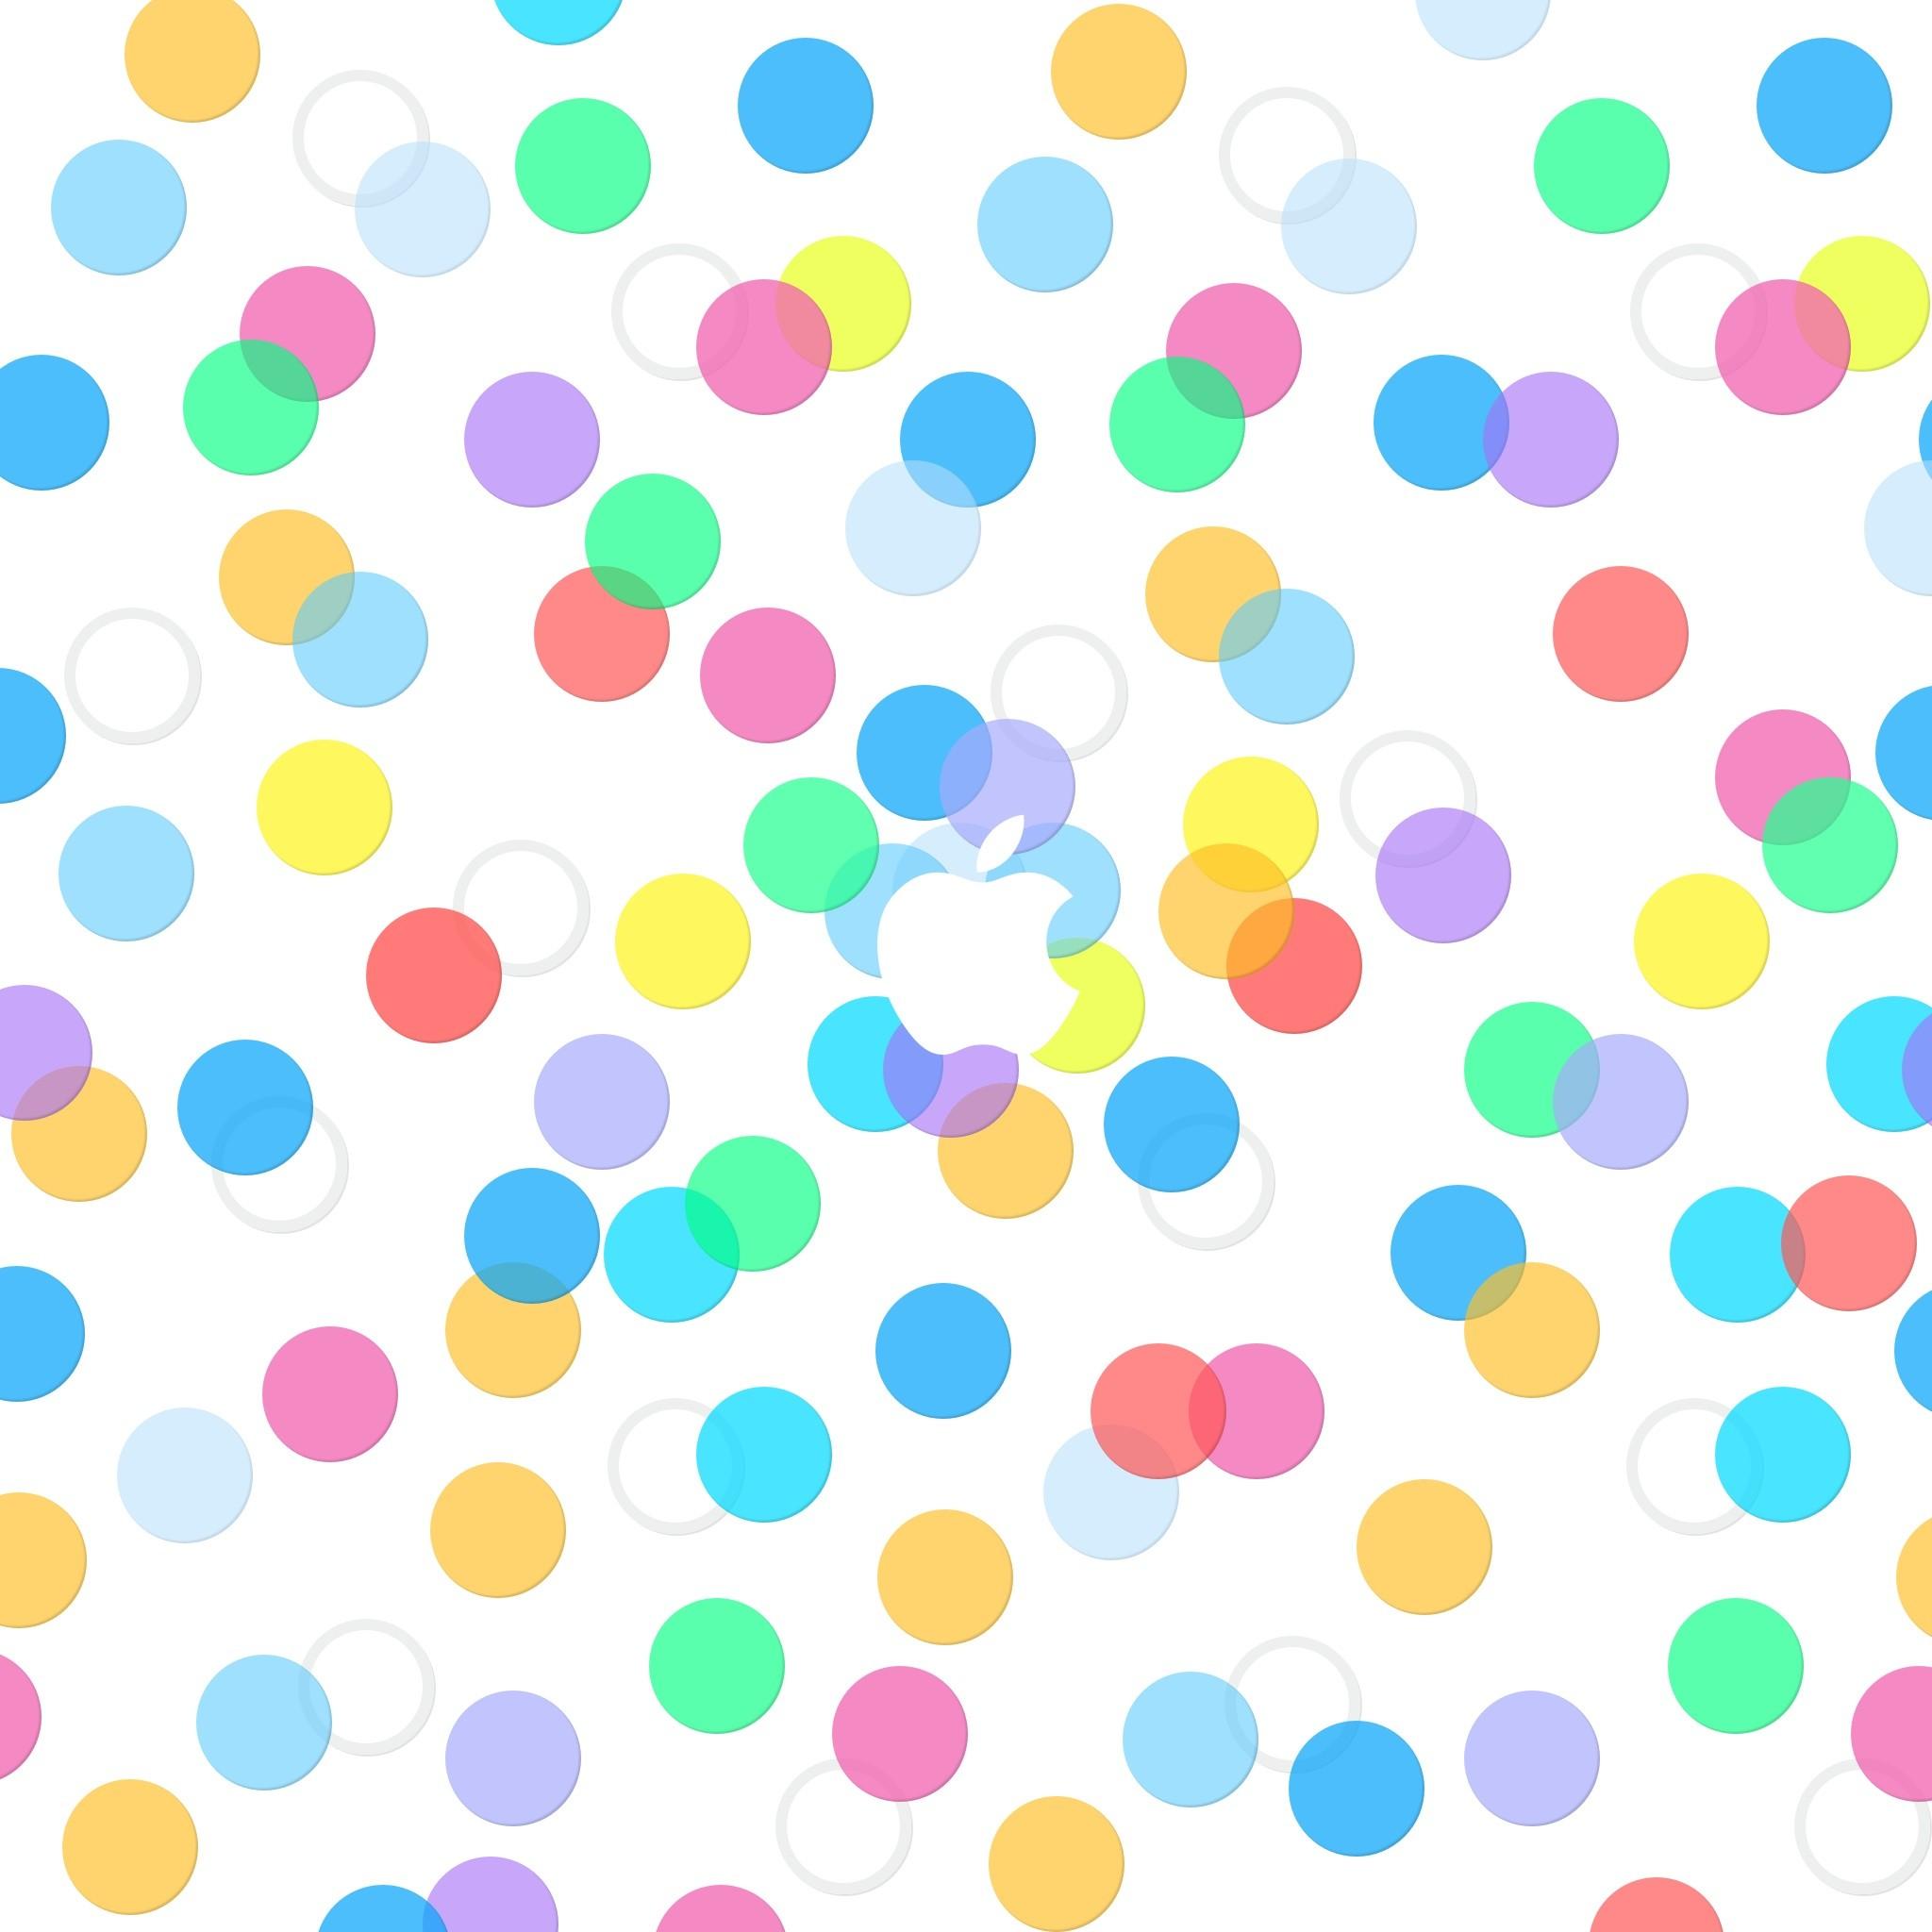 Apple Logo Colorful Dots Pattern iPad Wallpaper HD